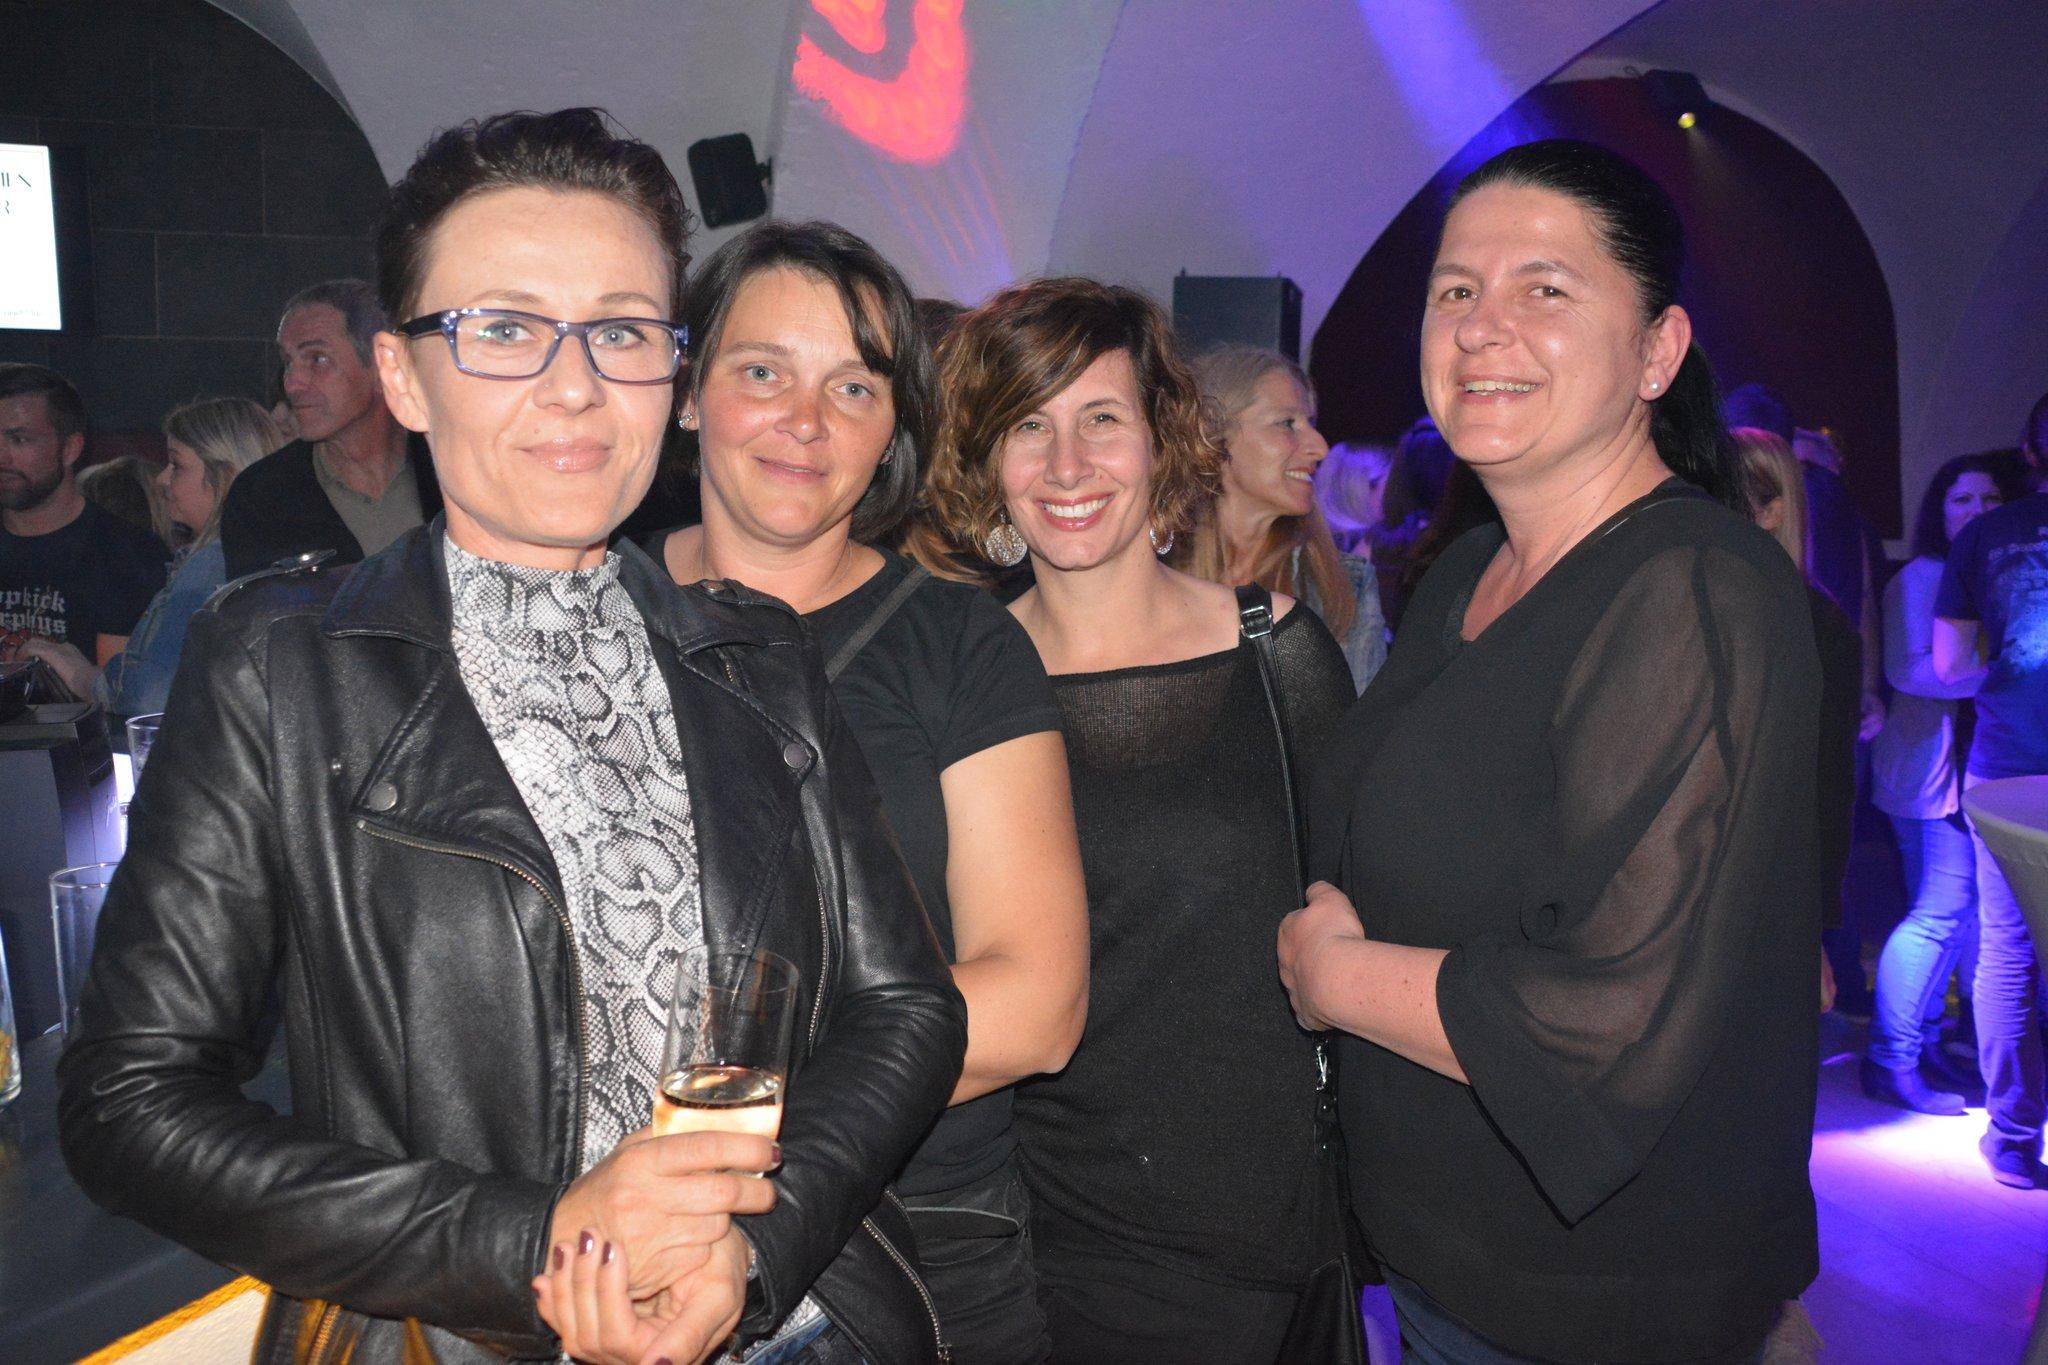 Beste dating app peuerbach, Maria saal treffen singles